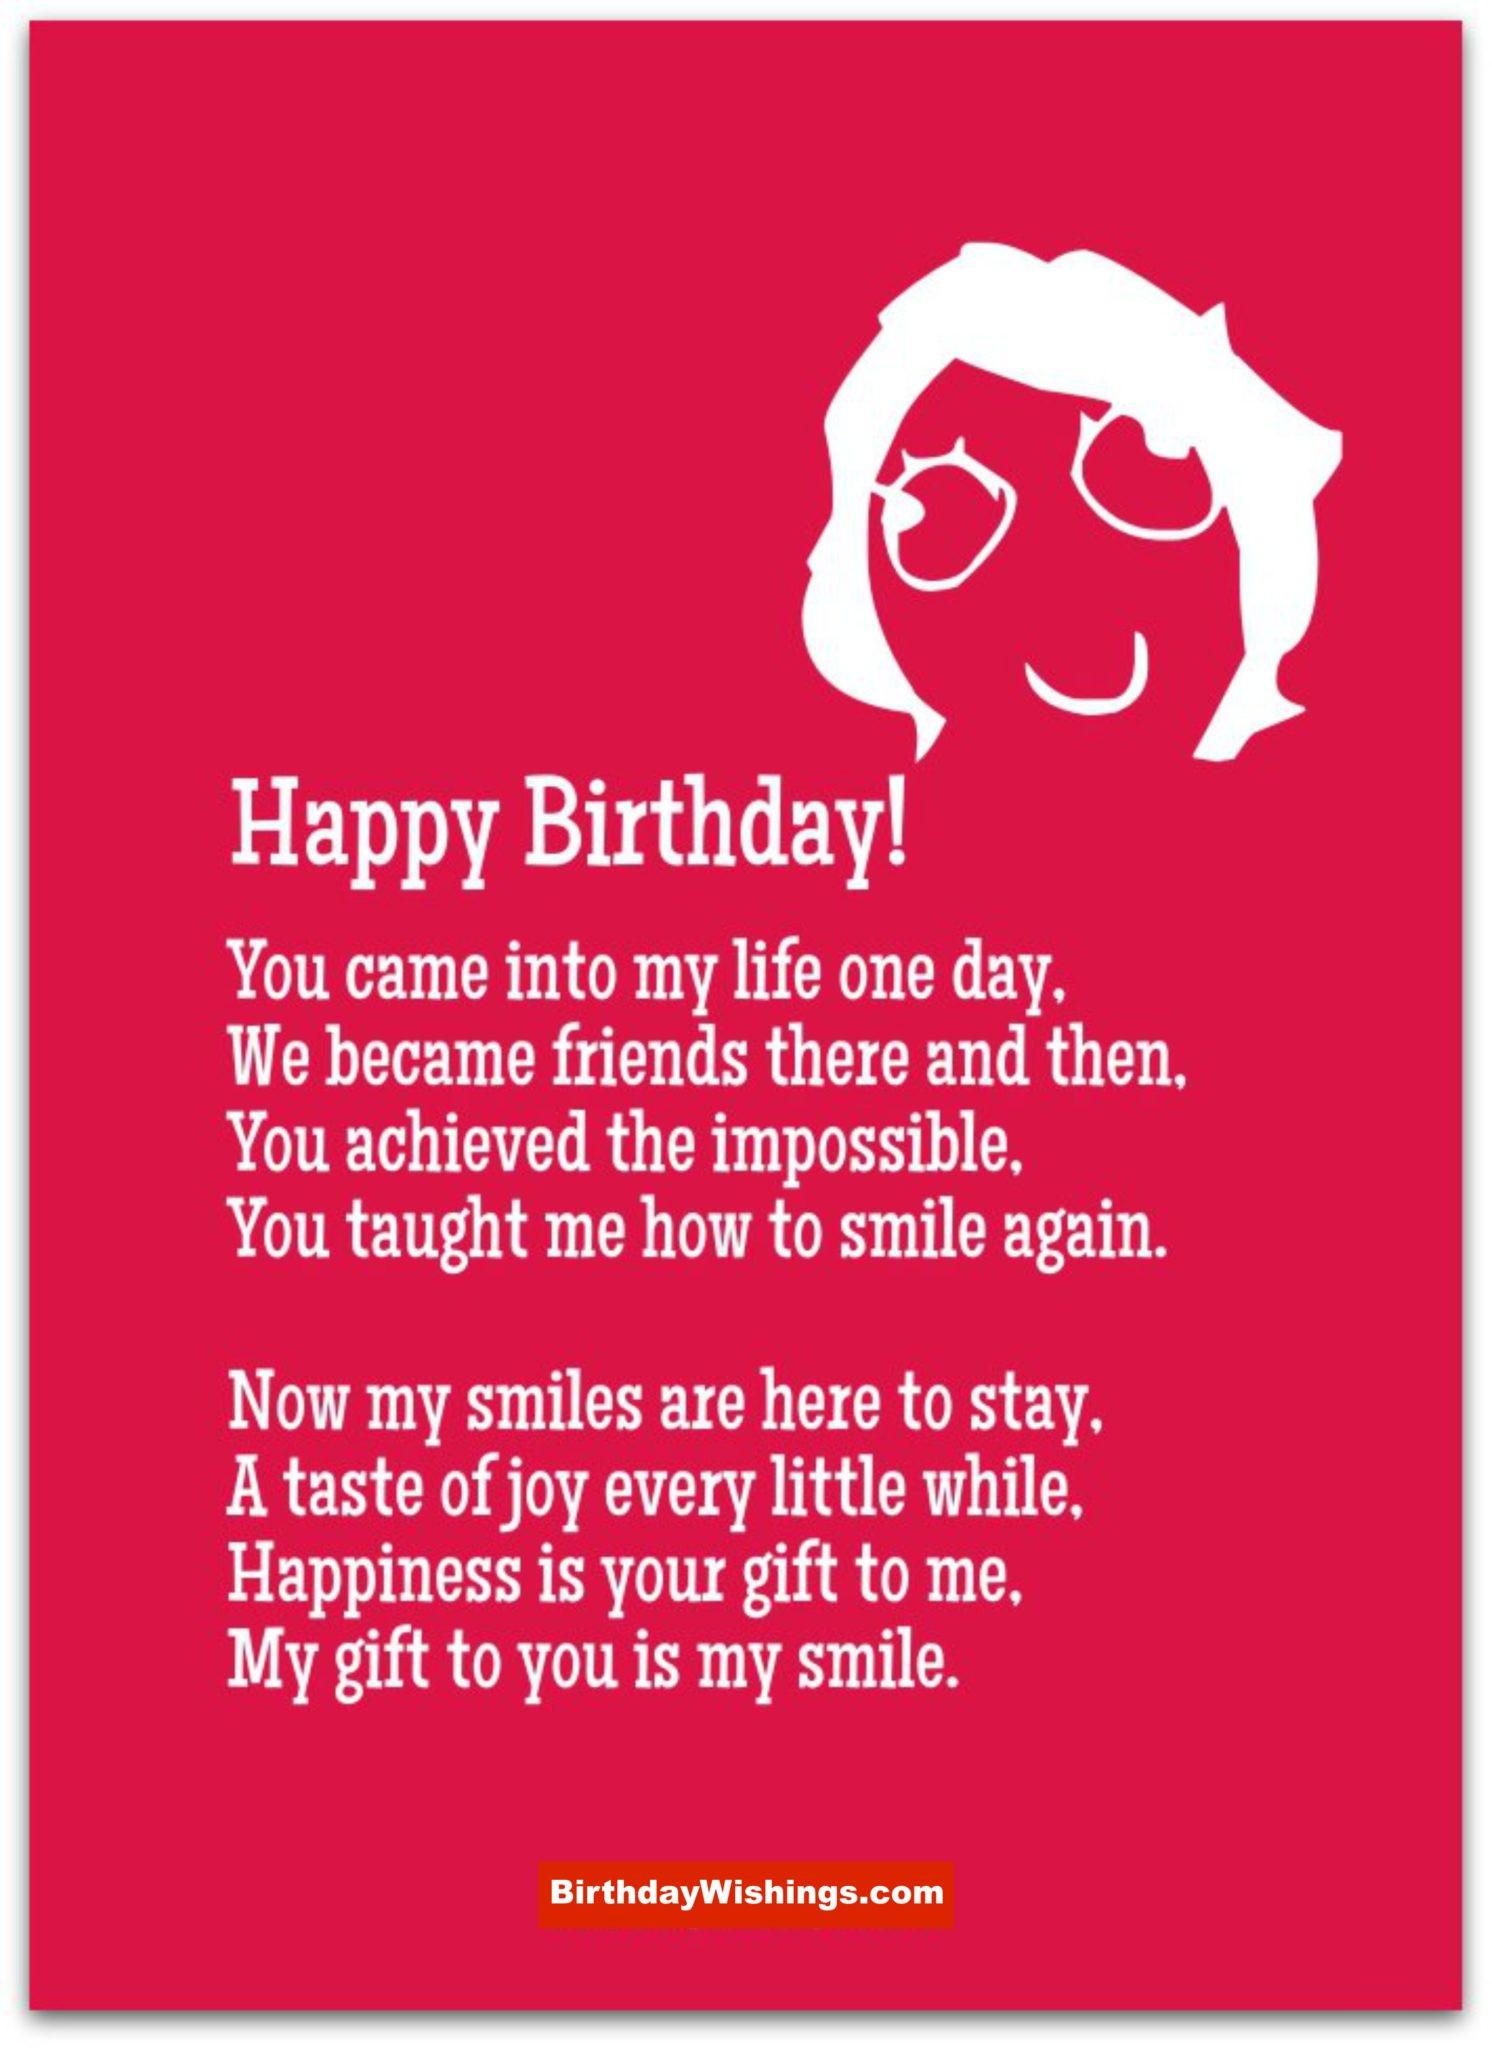 Birthday Wishes Poems  Birthday Poem For Best Friend